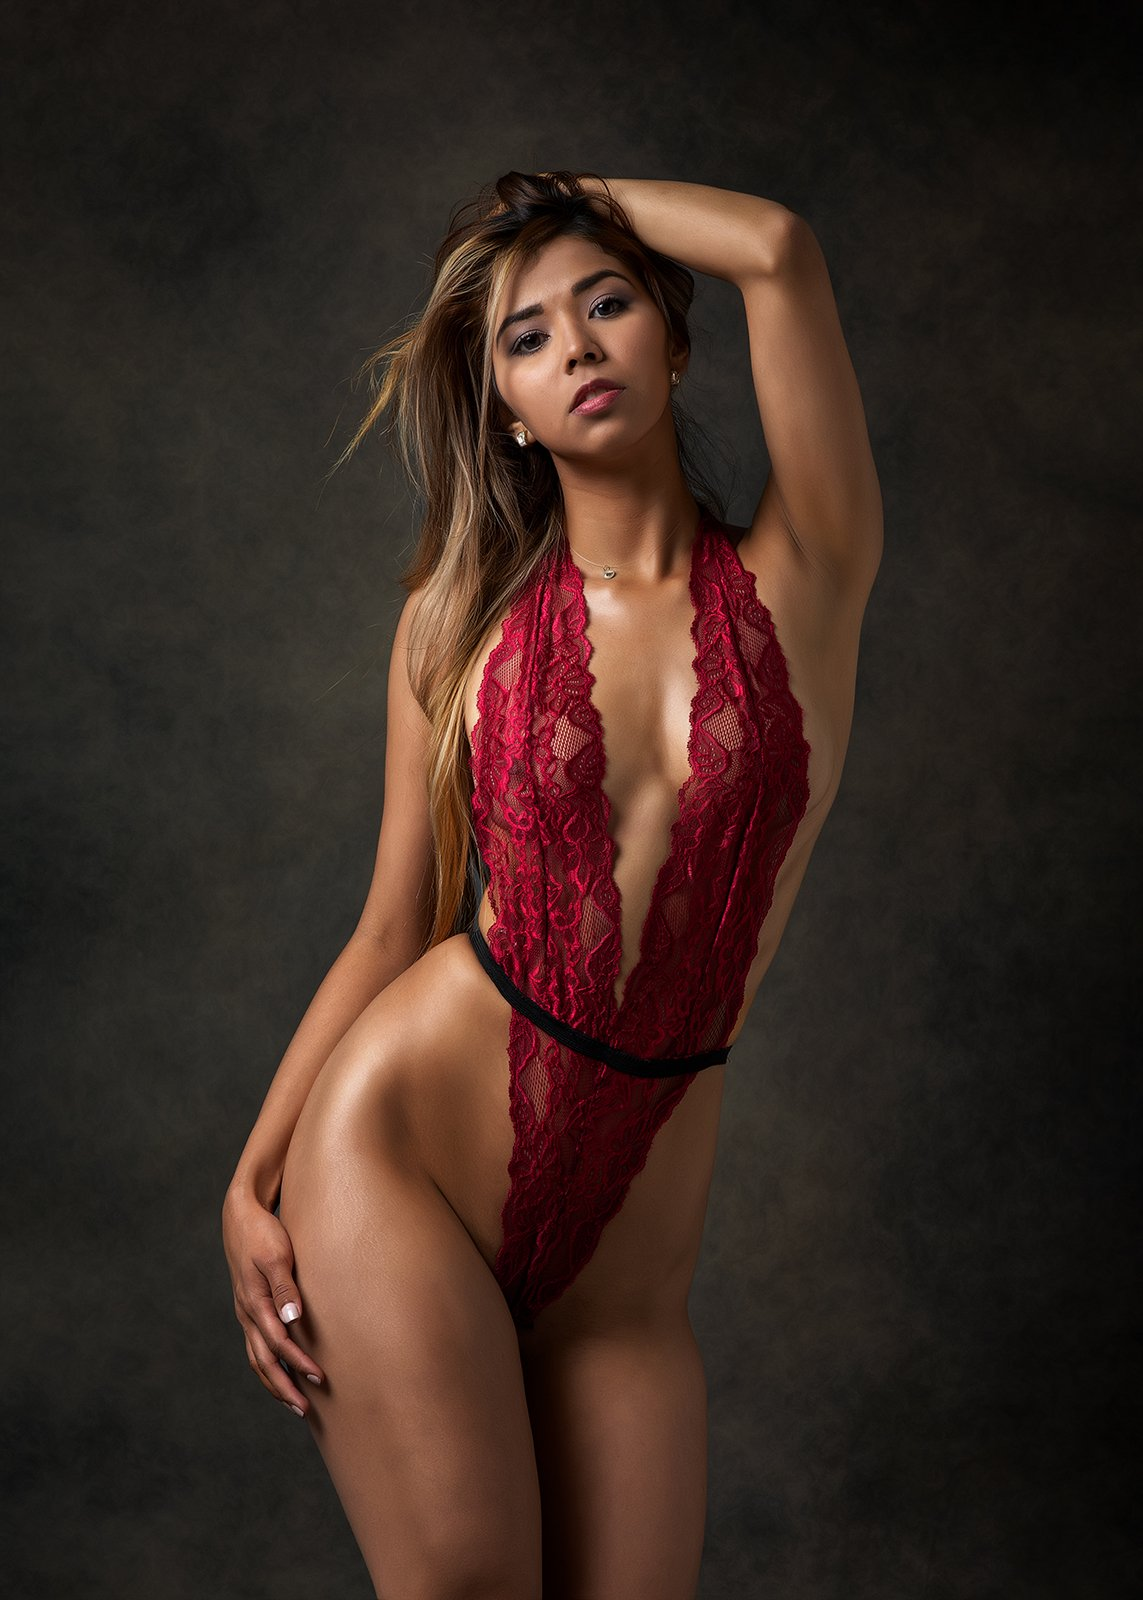 sexy, fashion, hot, latin, fitness, latin, mexican, girl, curves, hot, abs, сексуальный, горячий, дамское белье,venezuela,venezolan, Luis Gastón